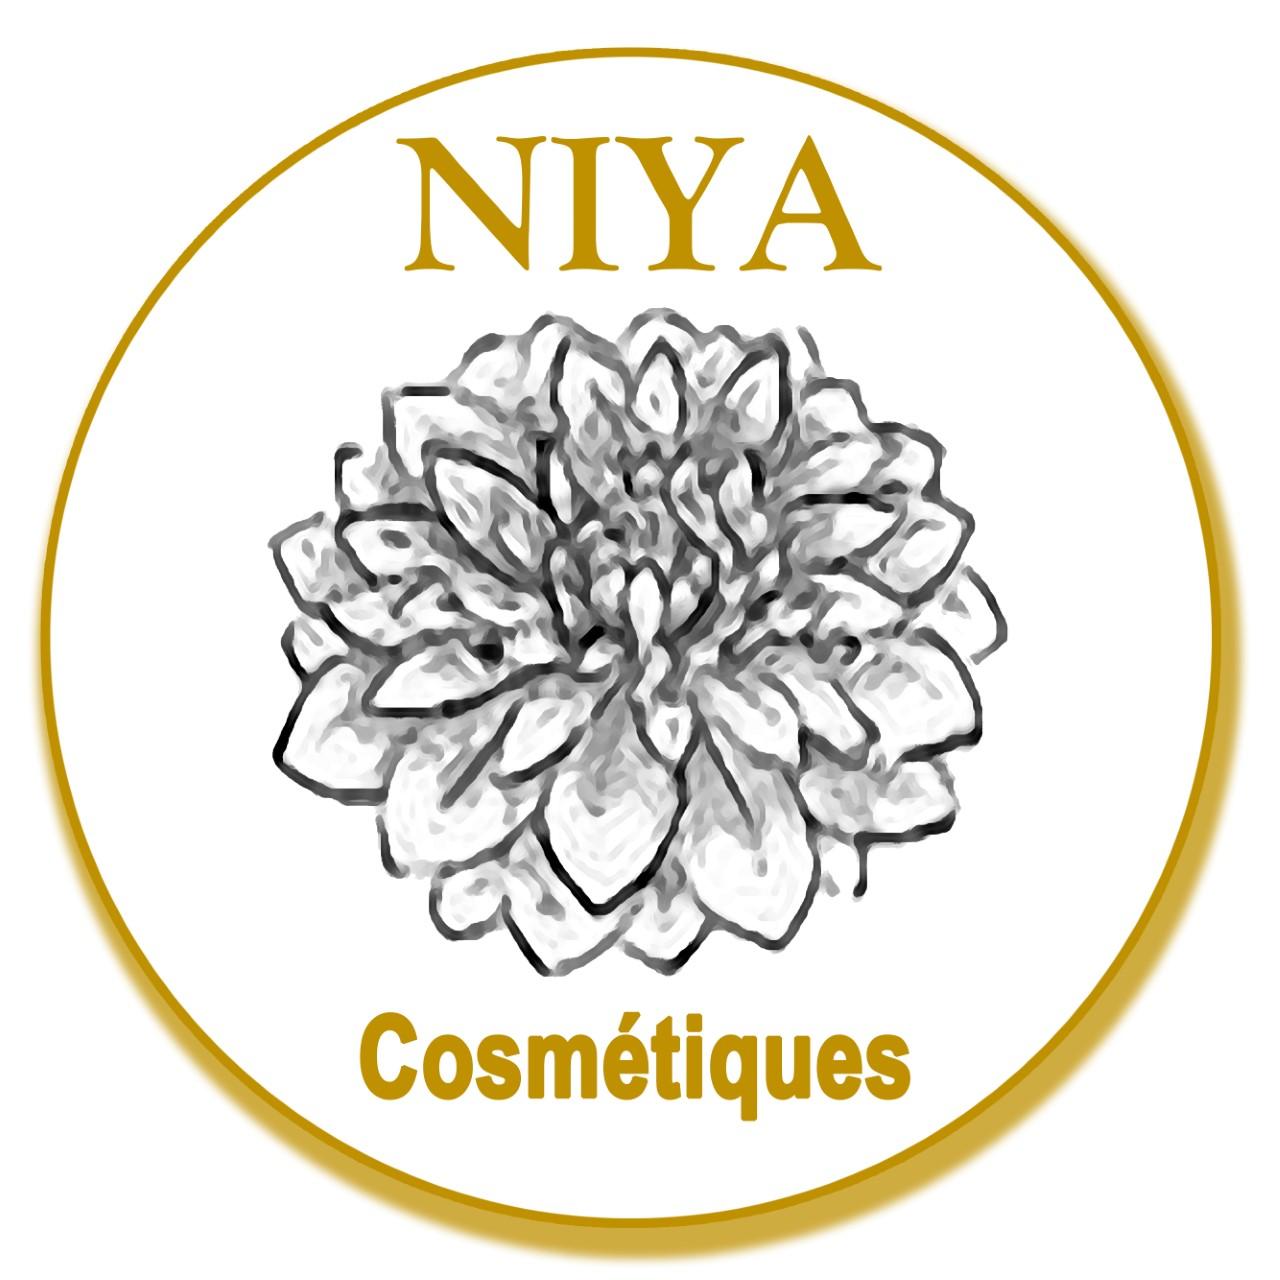 Niya Cosmétiques